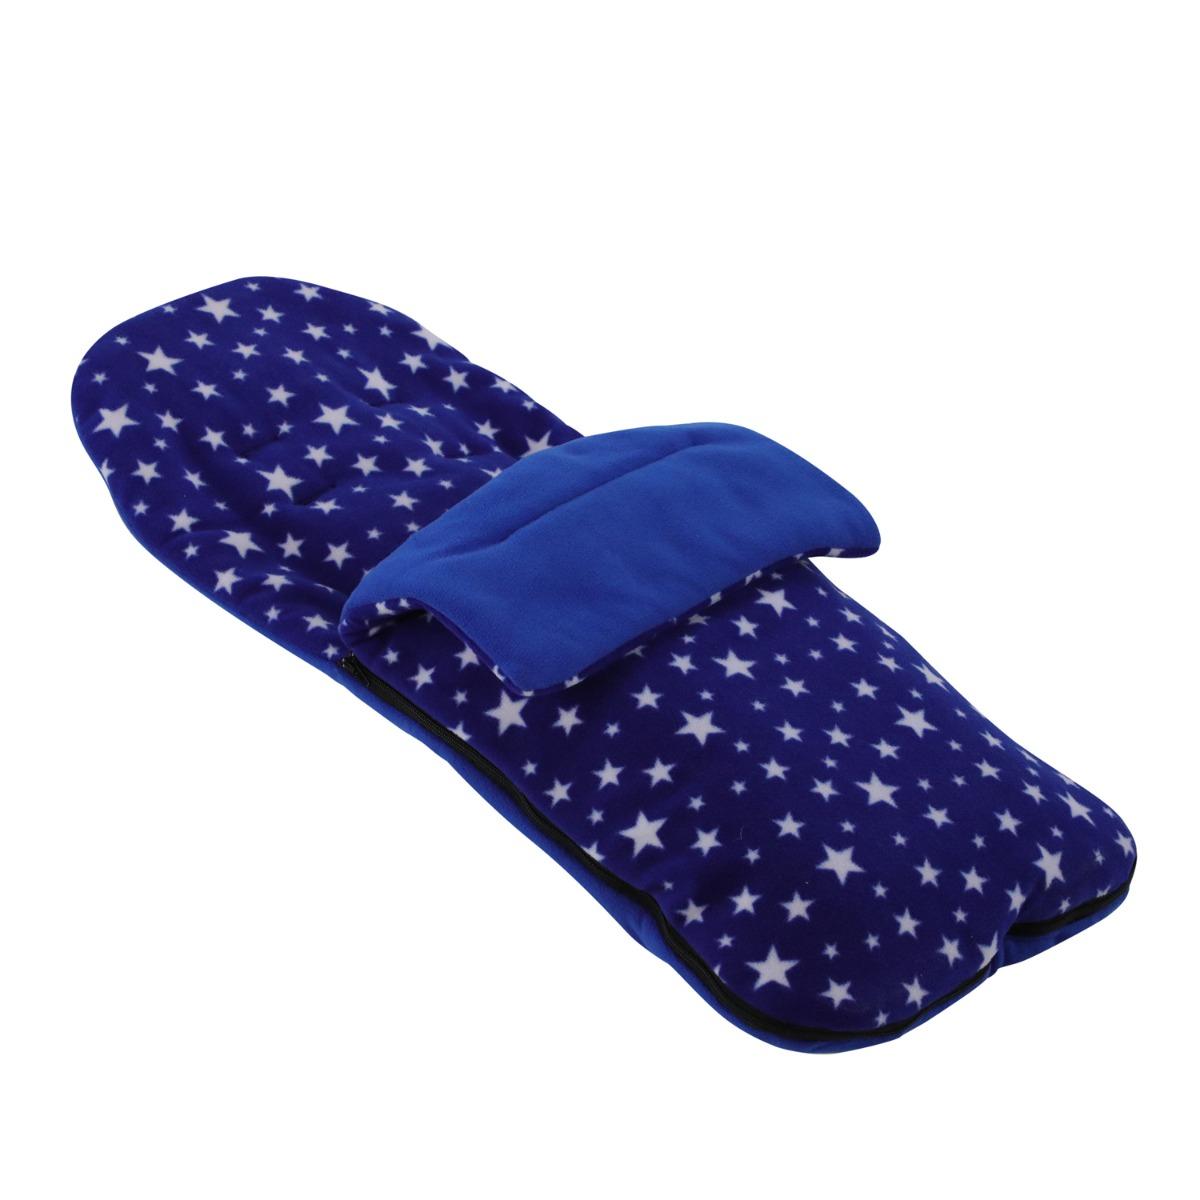 Black Star Cosy Toes Compatible with Venicci Shadow Fleece Footmuff